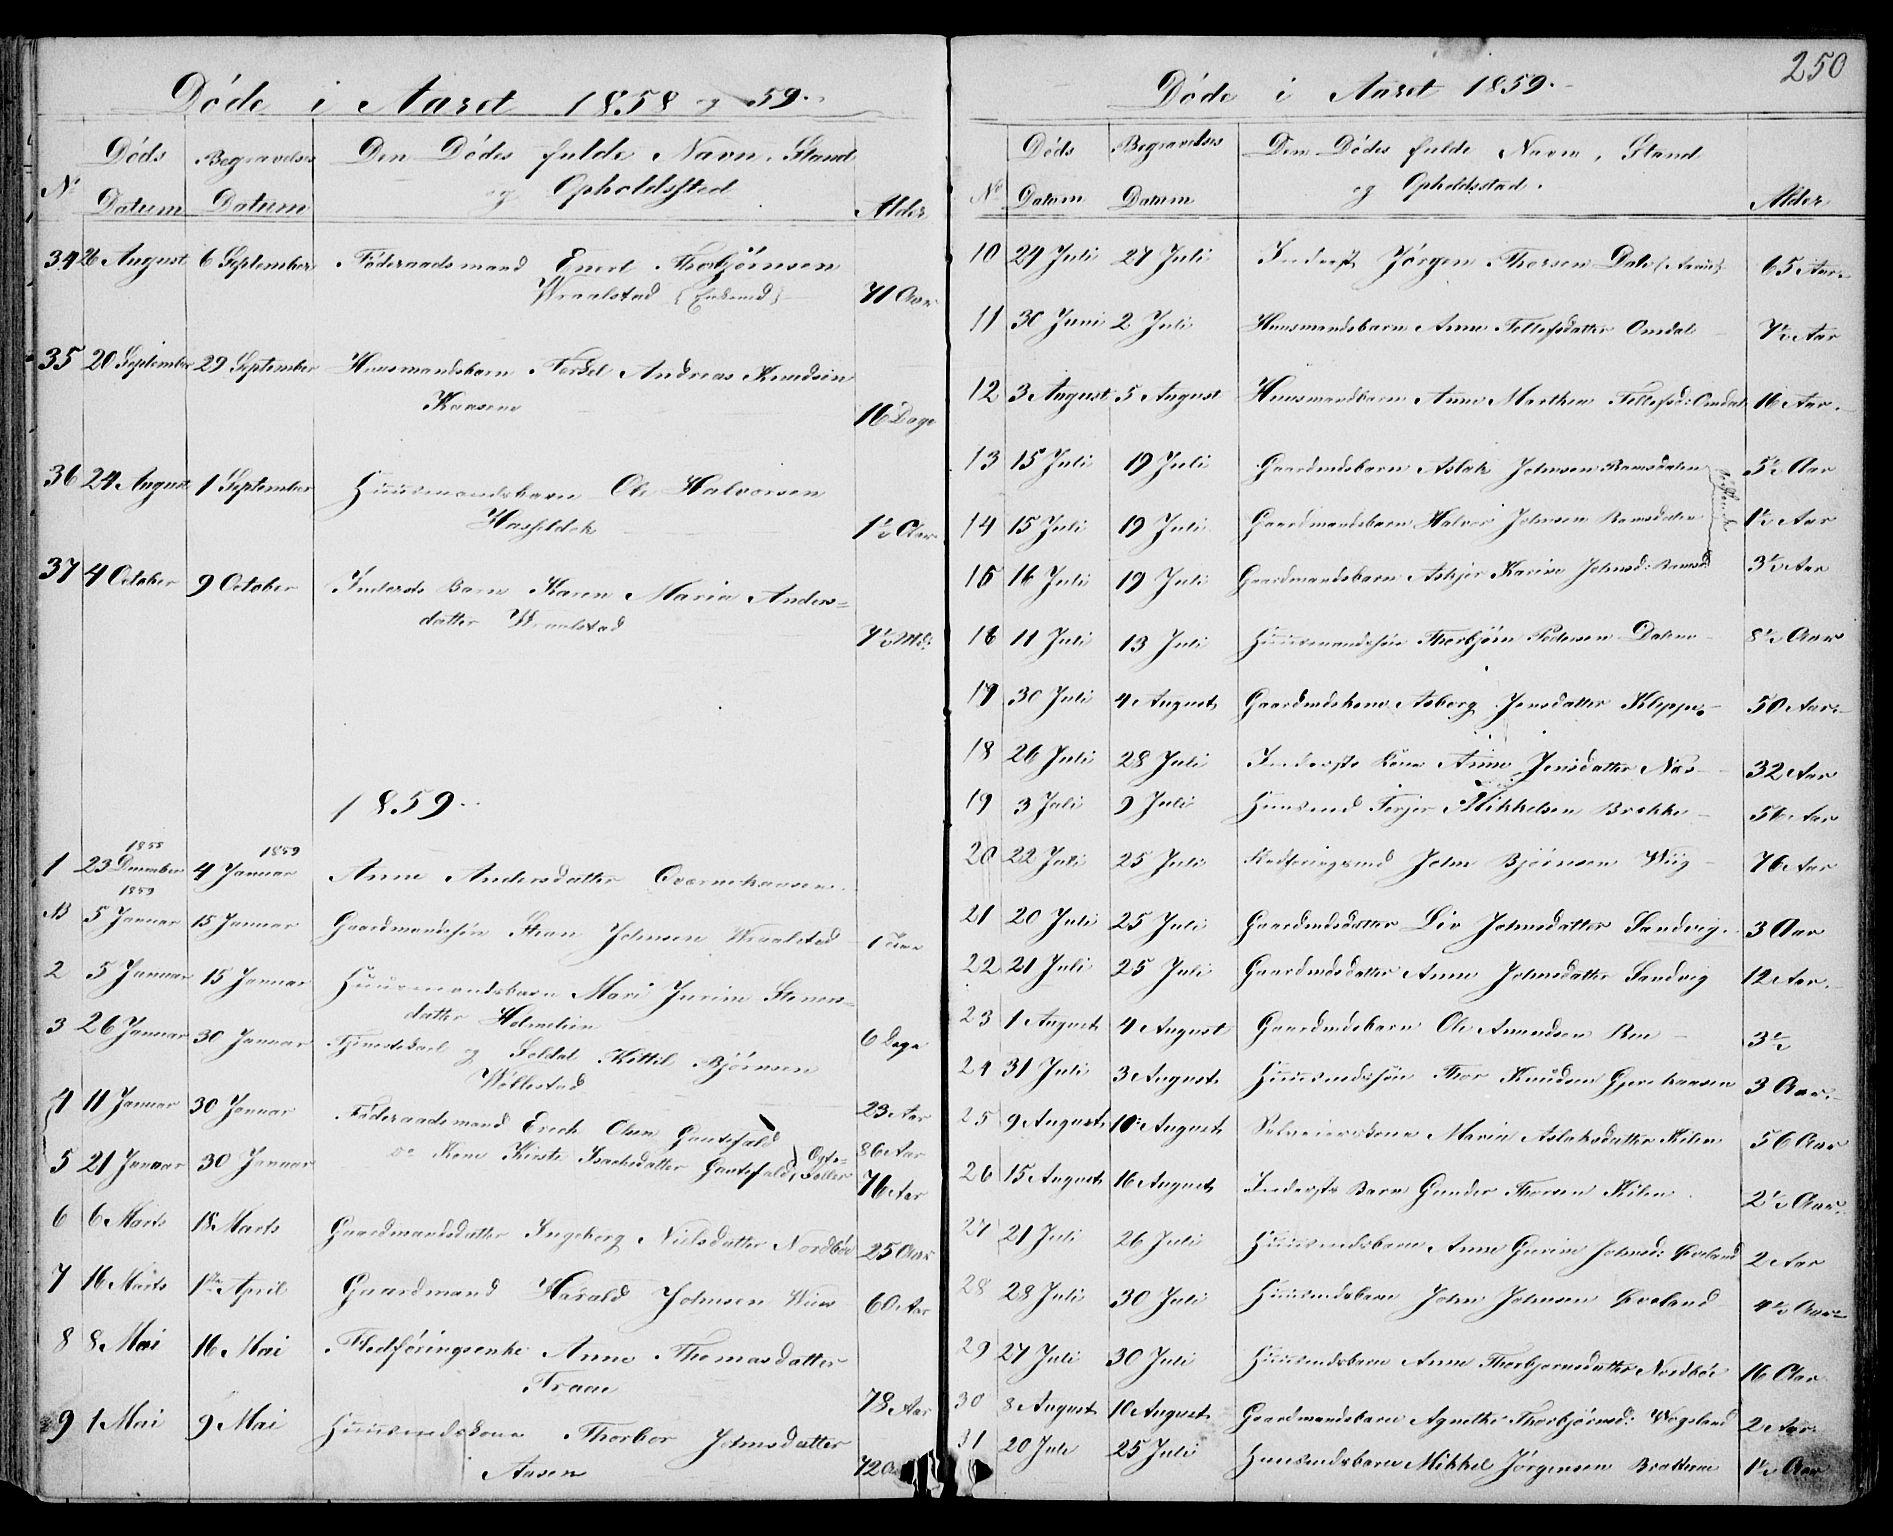 SAKO, Drangedal kirkebøker, G/Gb/L0001: Klokkerbok nr. II 1, 1856-1894, s. 250